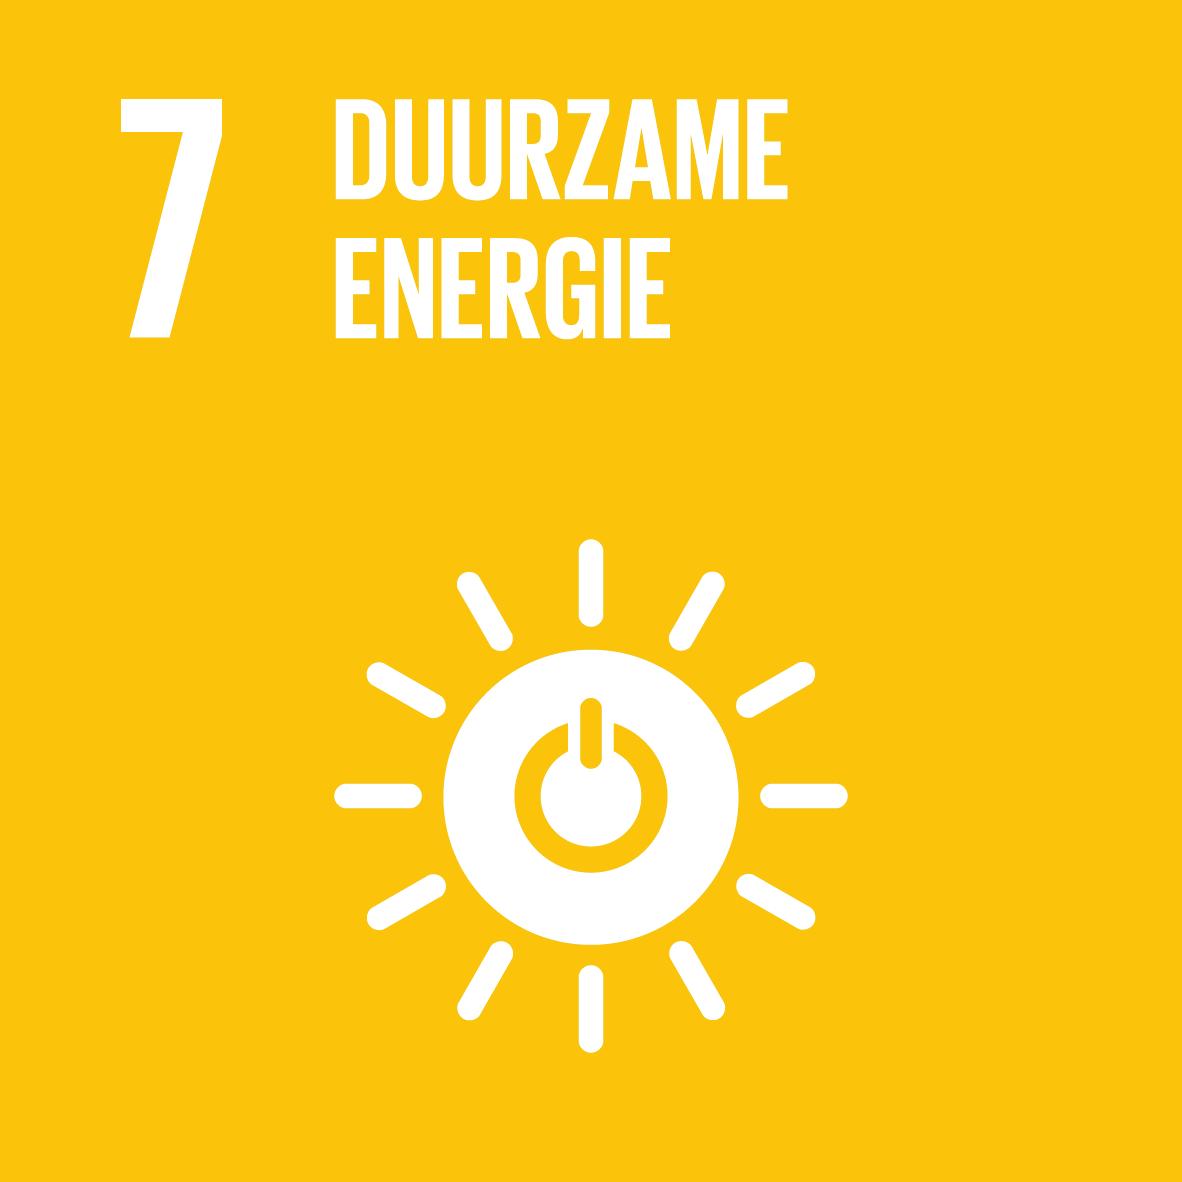 07. Duurzame energie